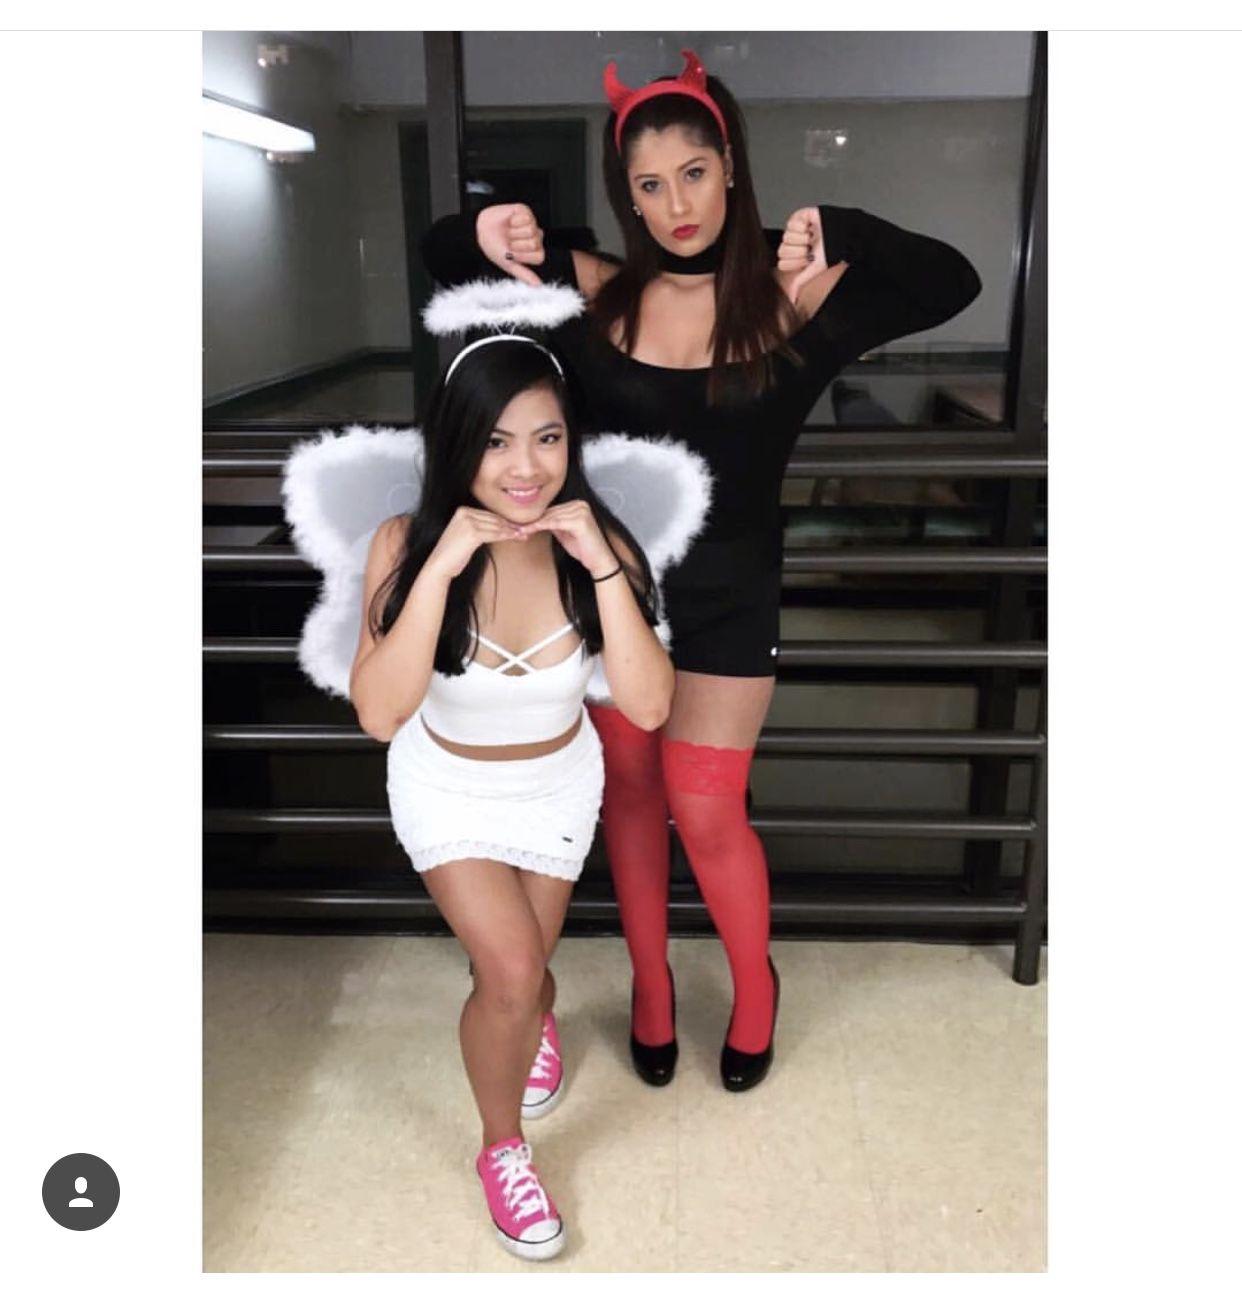 Heavenly devil halloween costume right! So